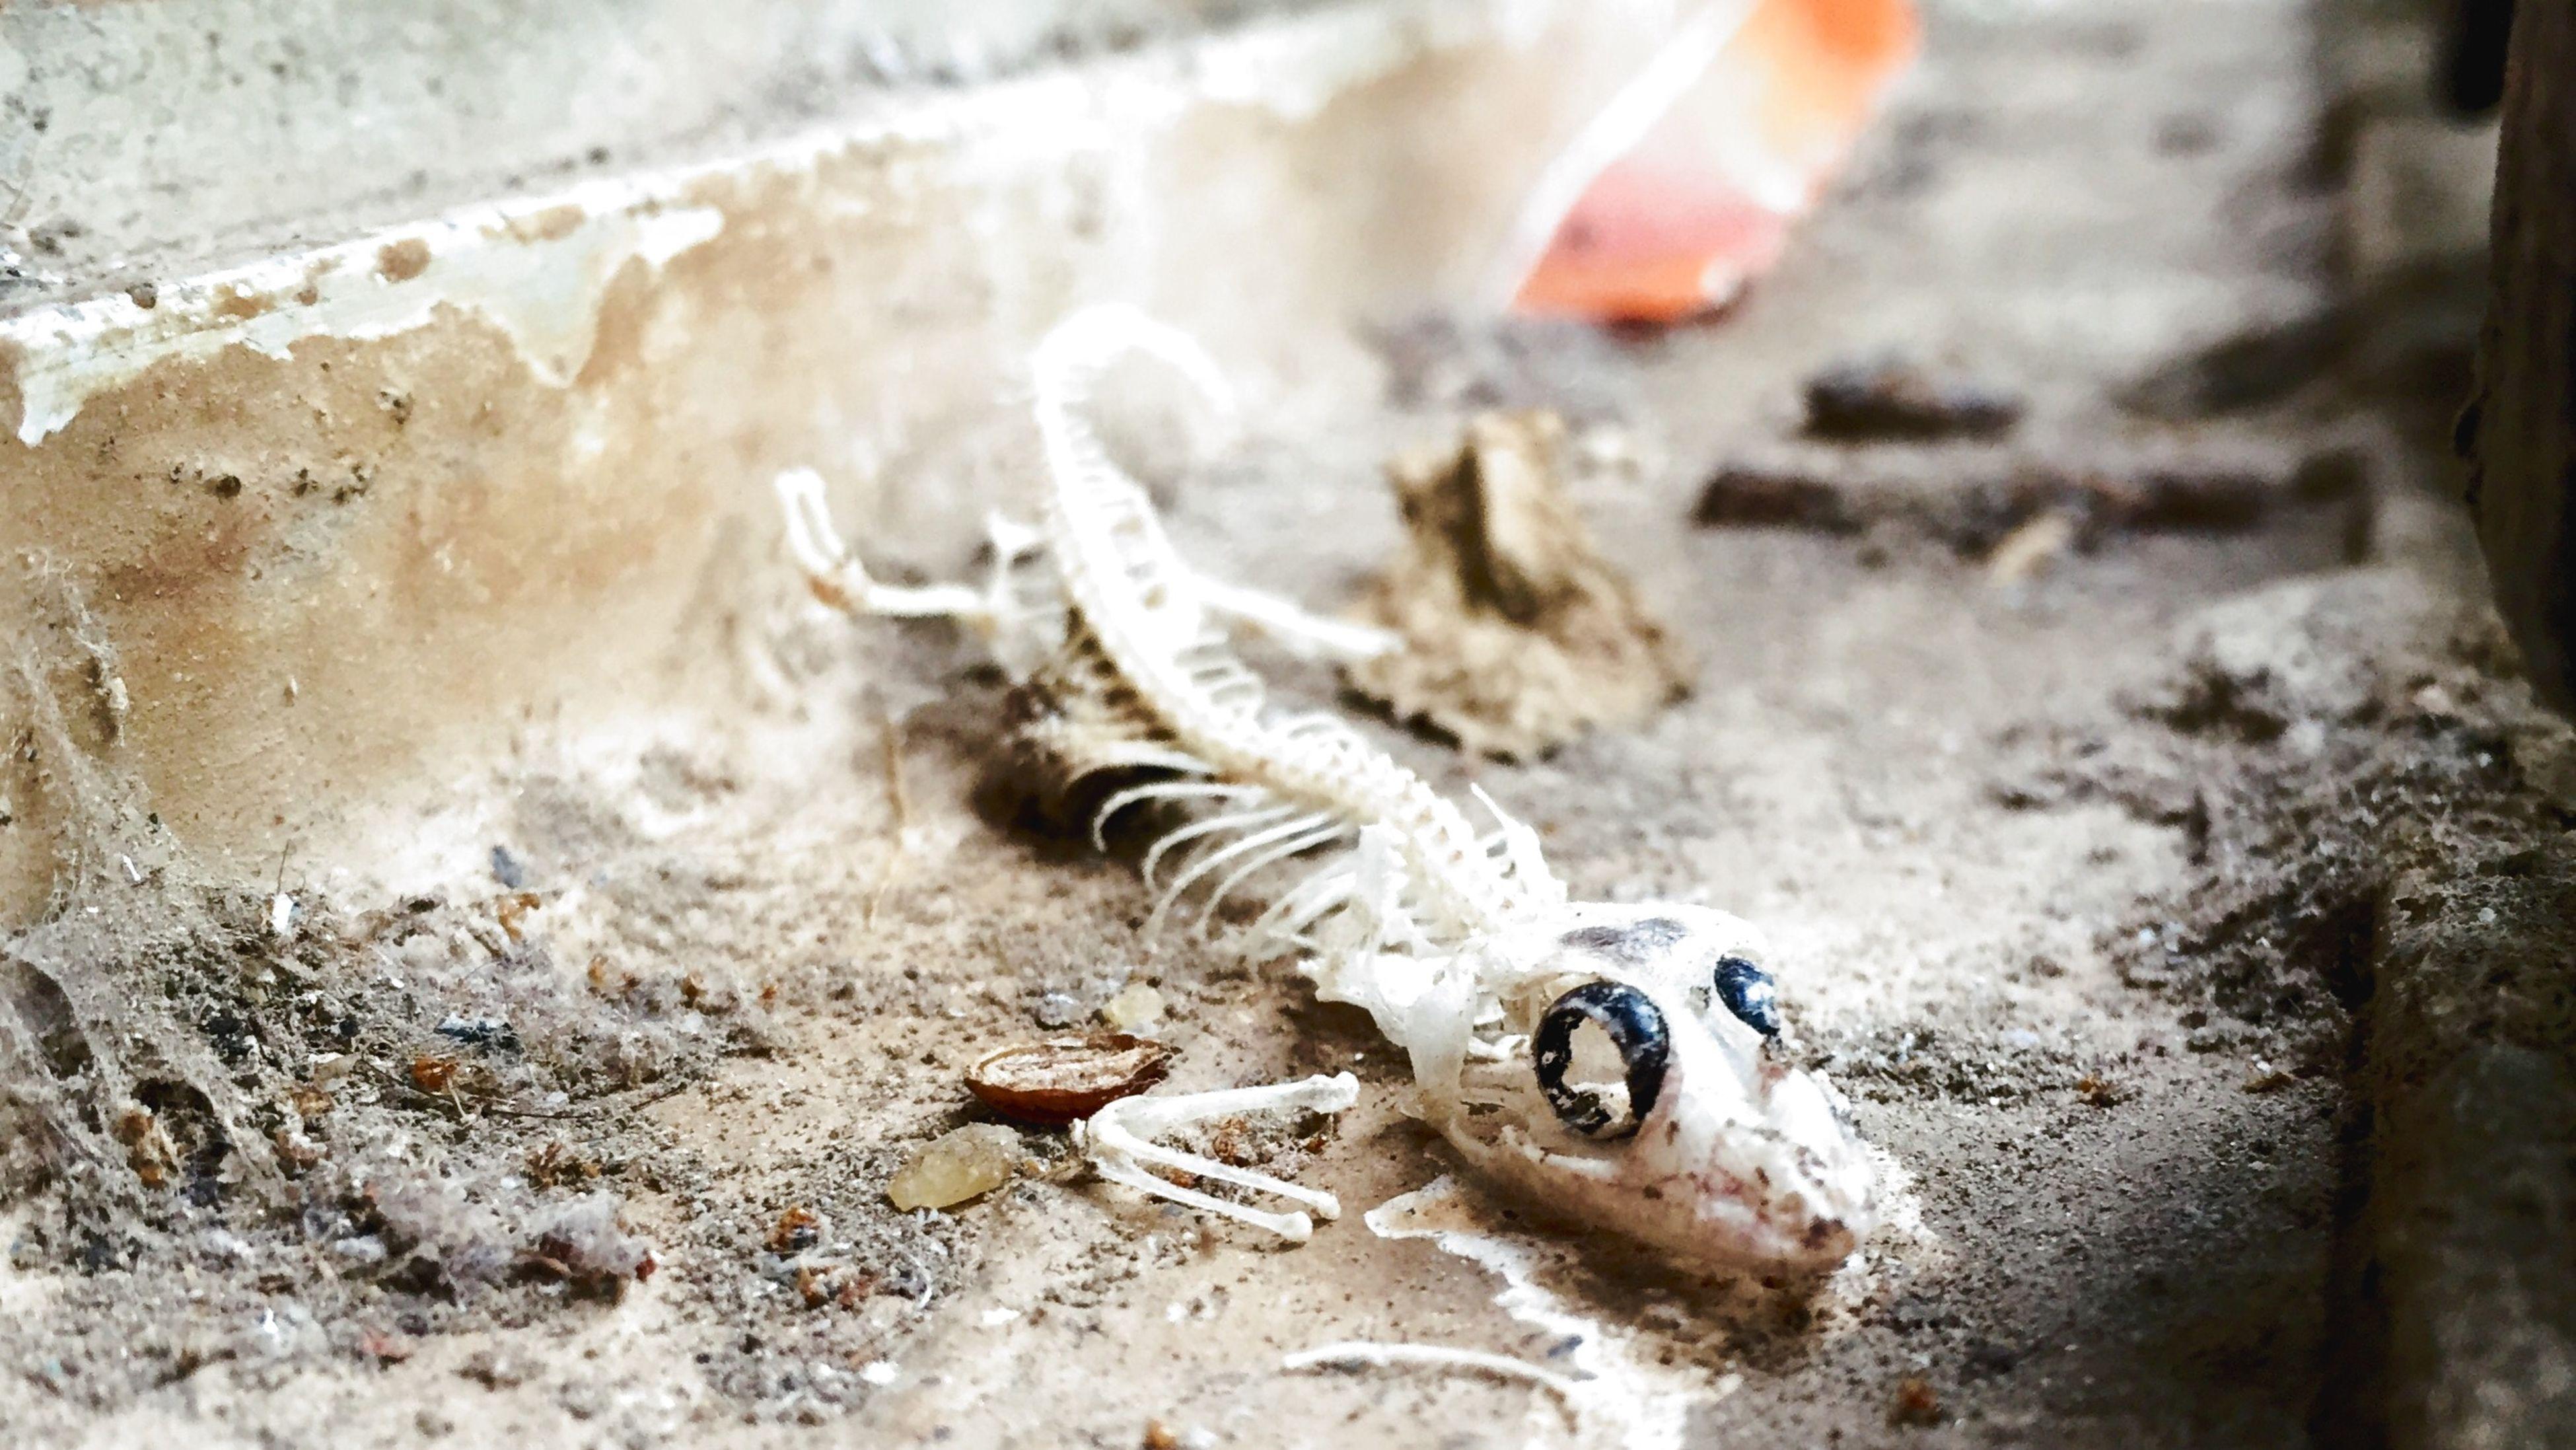 Fcuking Awsome! Output. Dead Lizard! Shot On IPhone 6 IShots PRShots